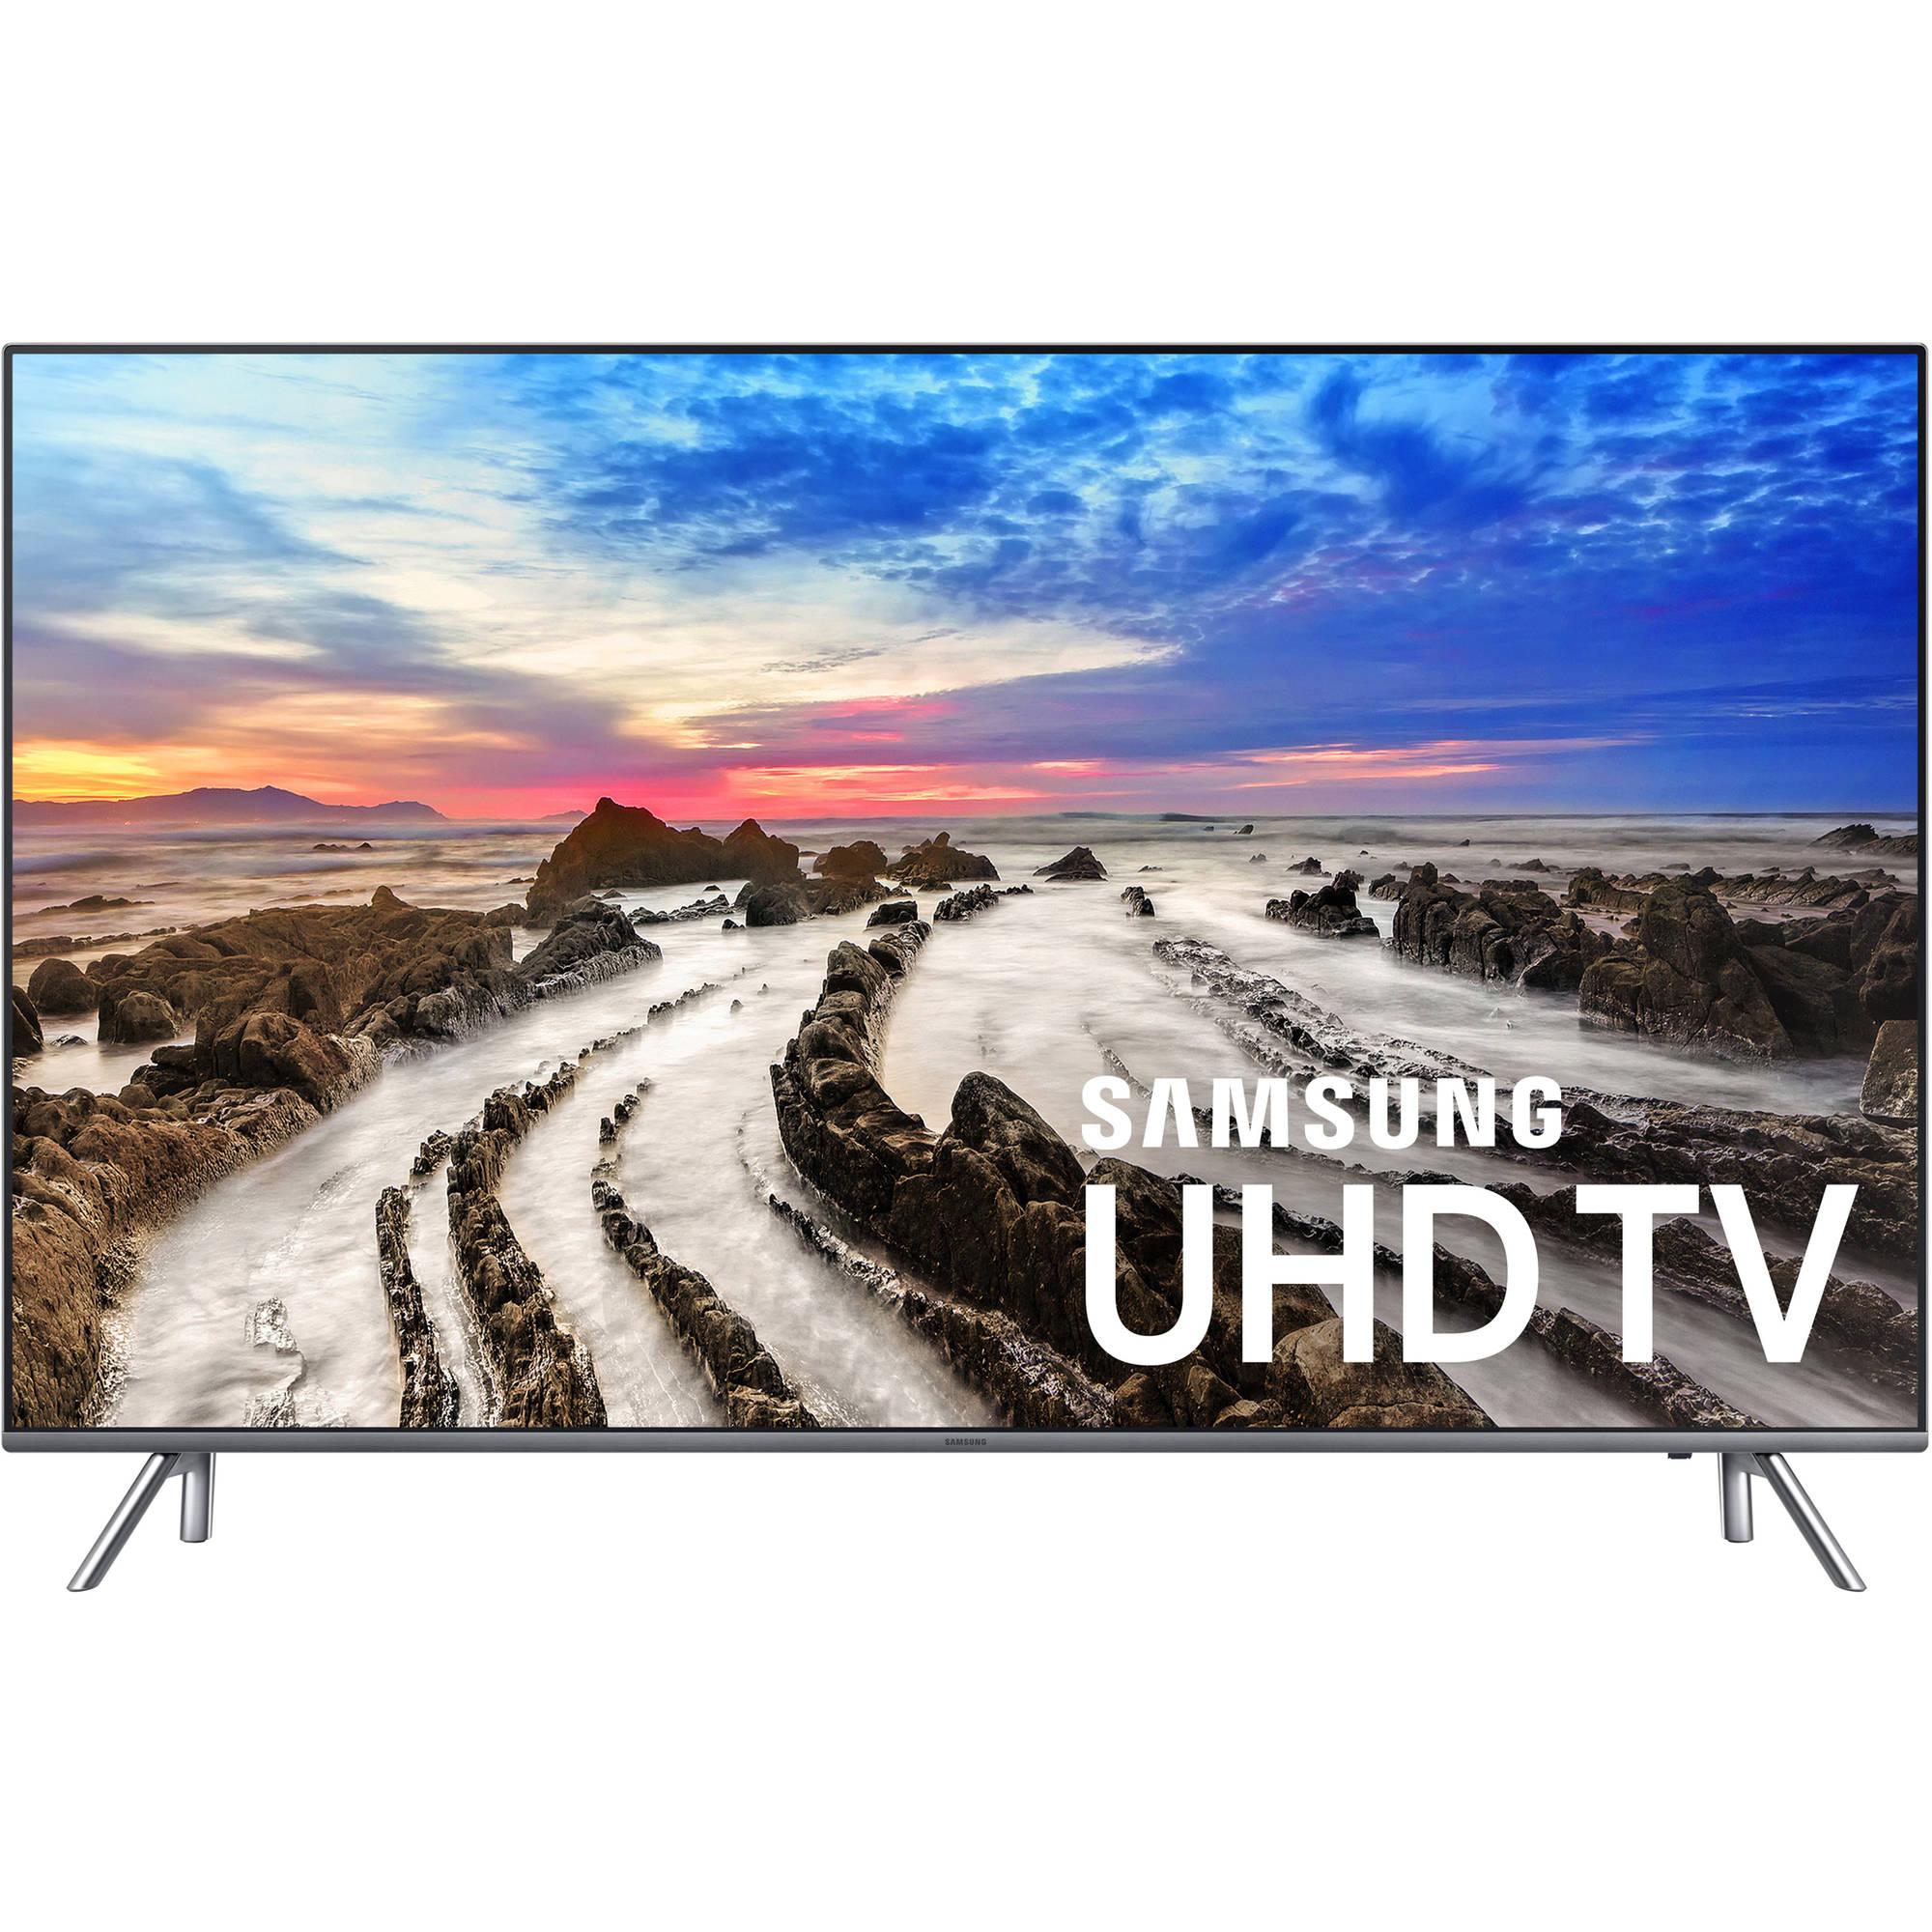 Samsung MU8000 TV (55-inch) product image